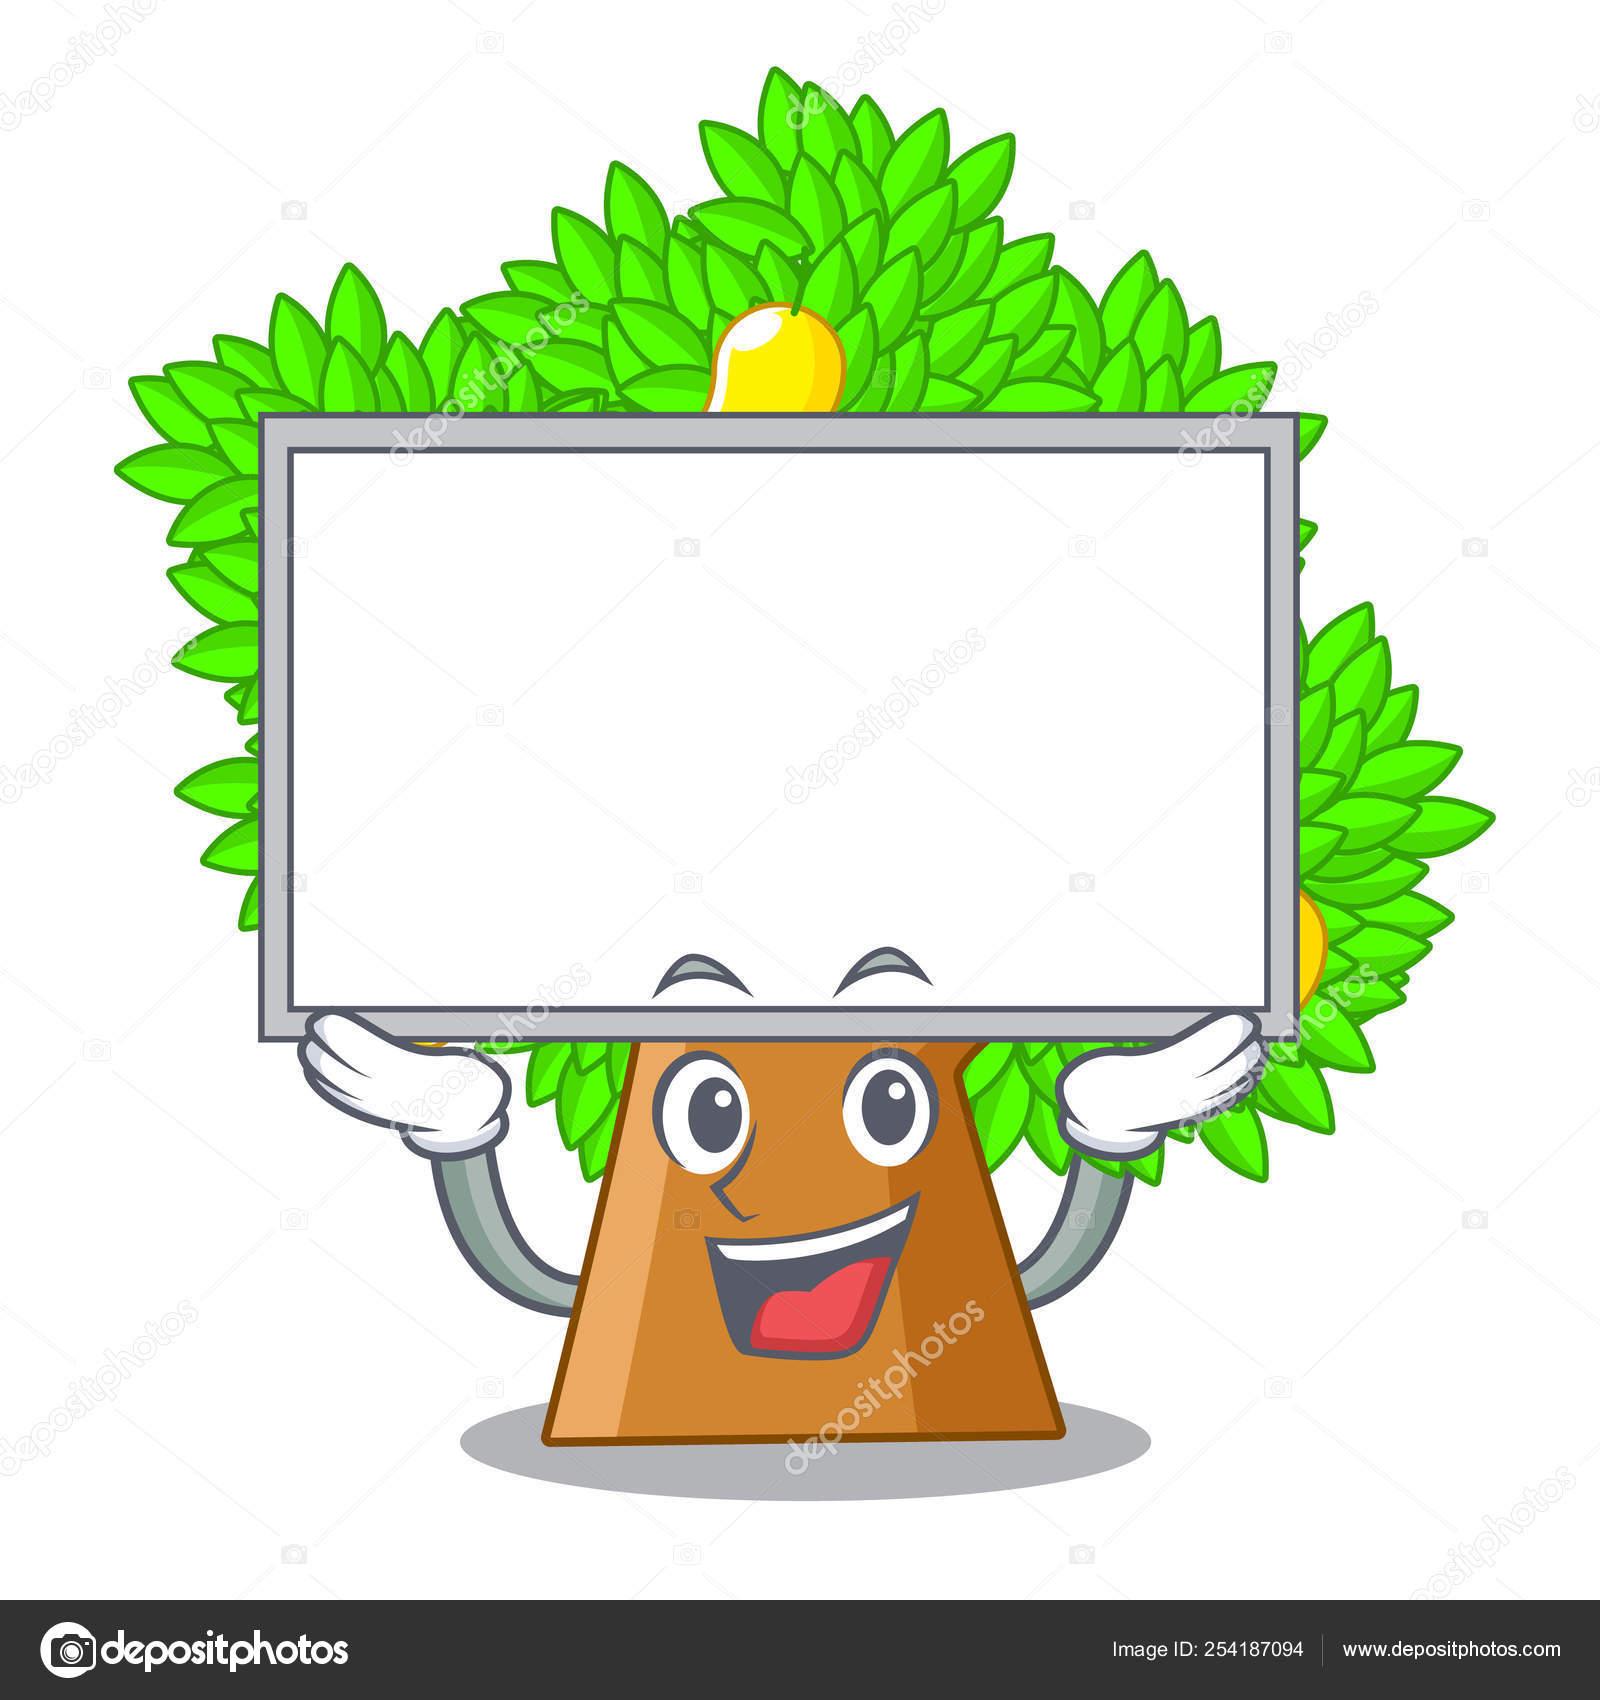 Up Board Mango Tree Isolated With The Mascot Stock Vector C Kongvector 254187094 Foam finger toy cartoon mango tree above table. up board mango tree isolated with the mascot stock vector c kongvector 254187094